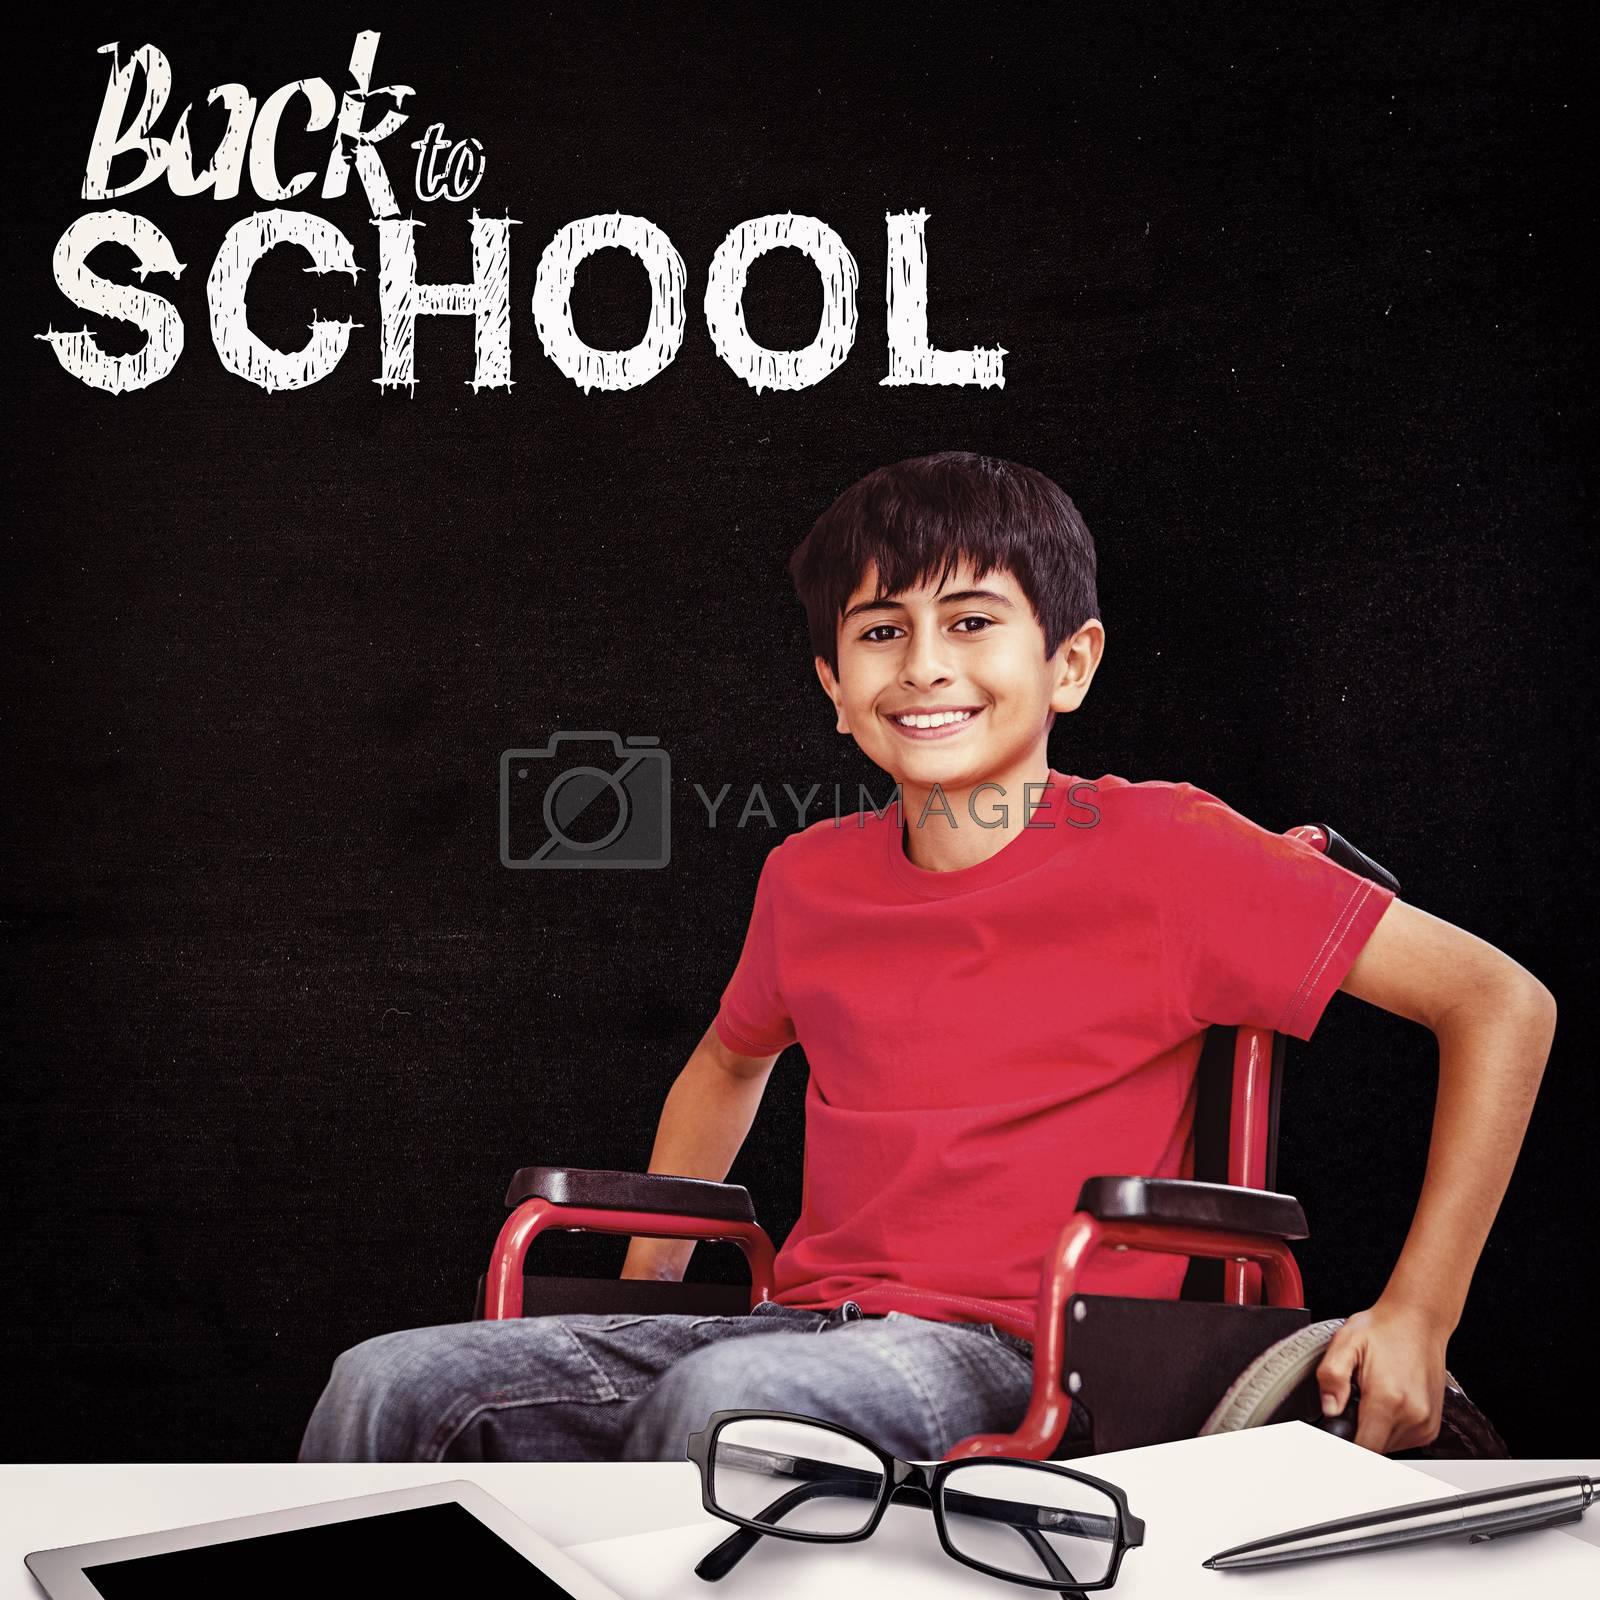 Portrait of boy sitting in wheelchair against black